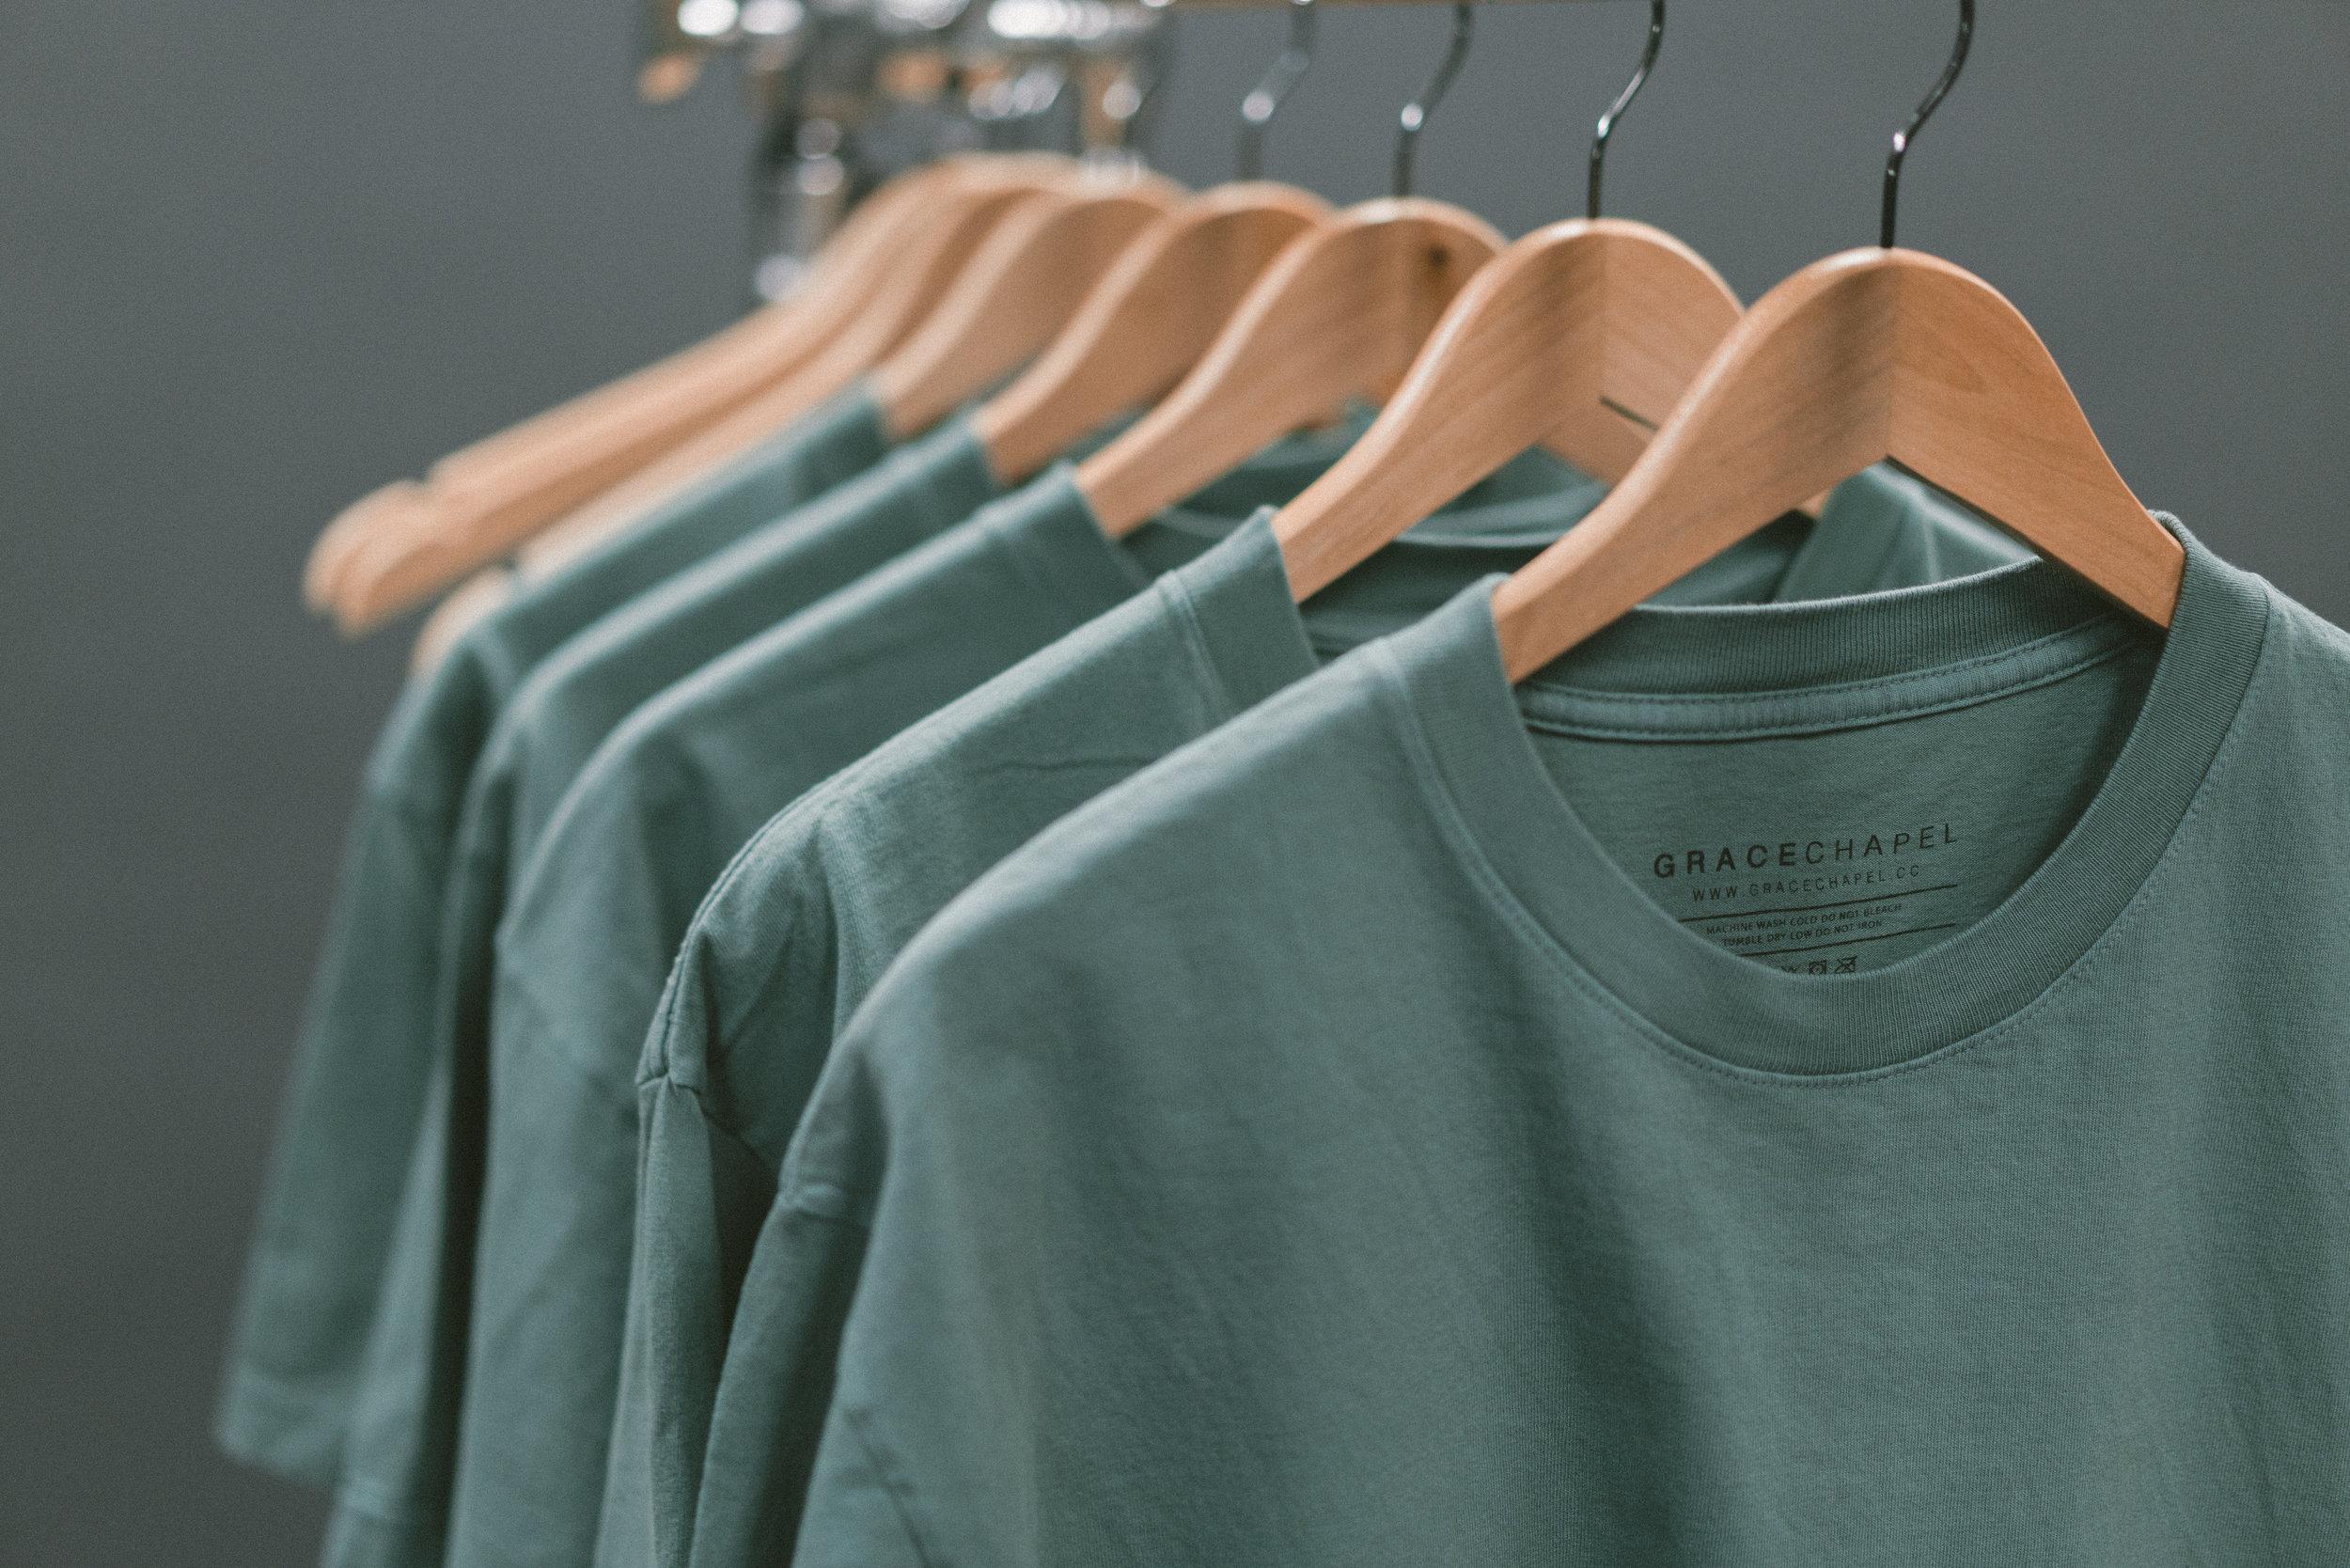 apdat-tear-away-tag-shirts-on-hanger